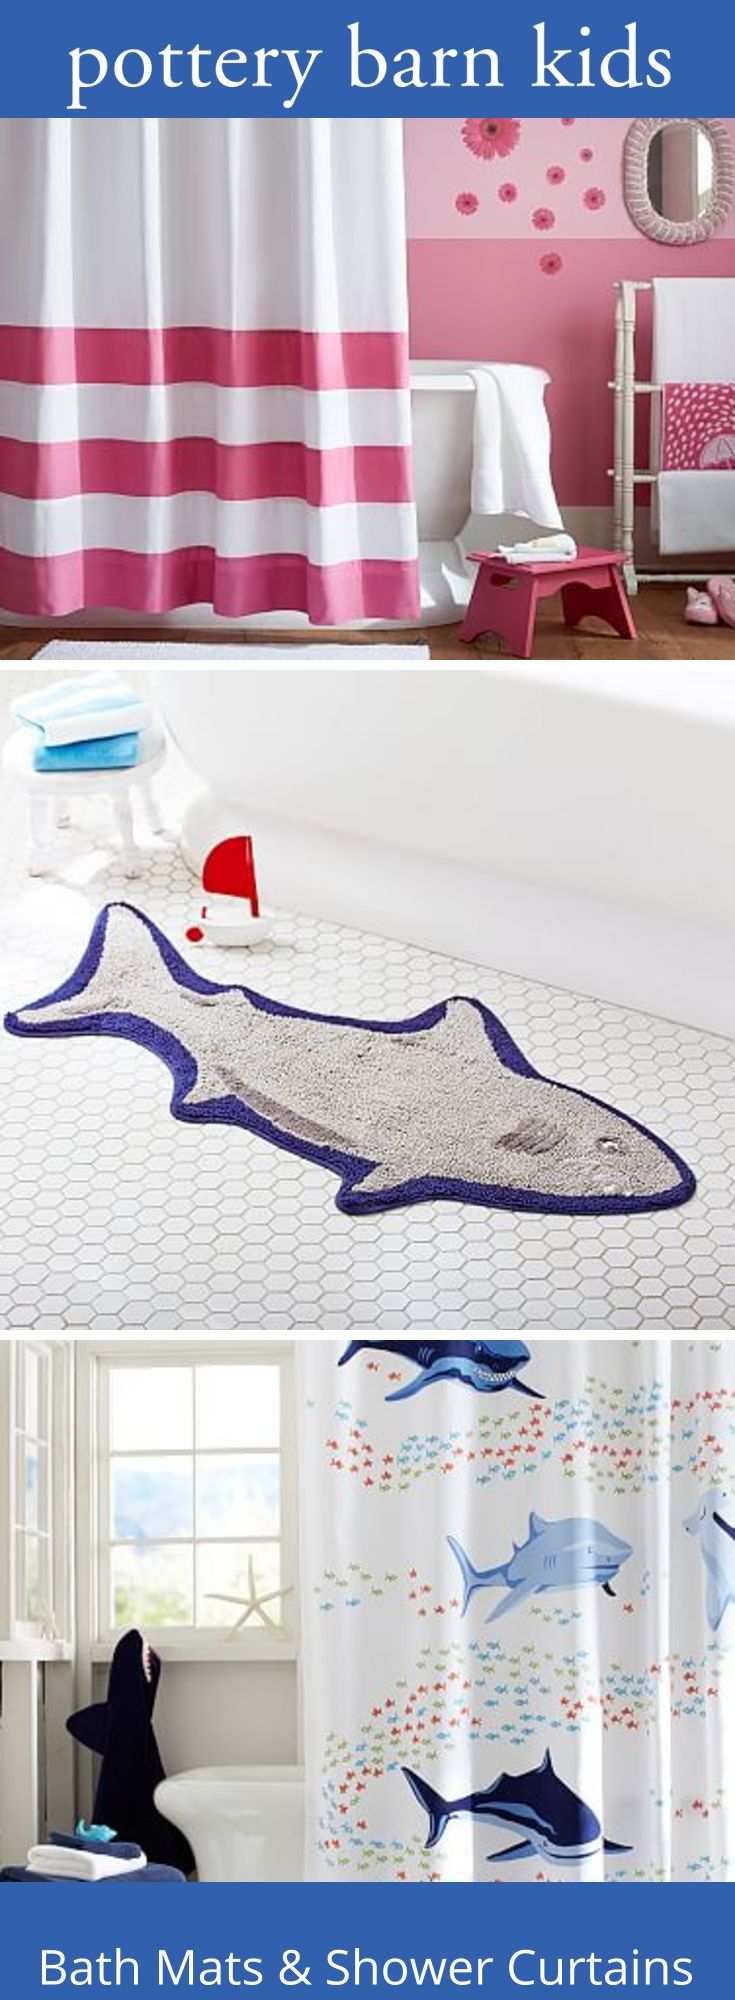 Nautica palmetto bay stripe shower curtain from beddingstyle com - Bath Mats Shower Curtains